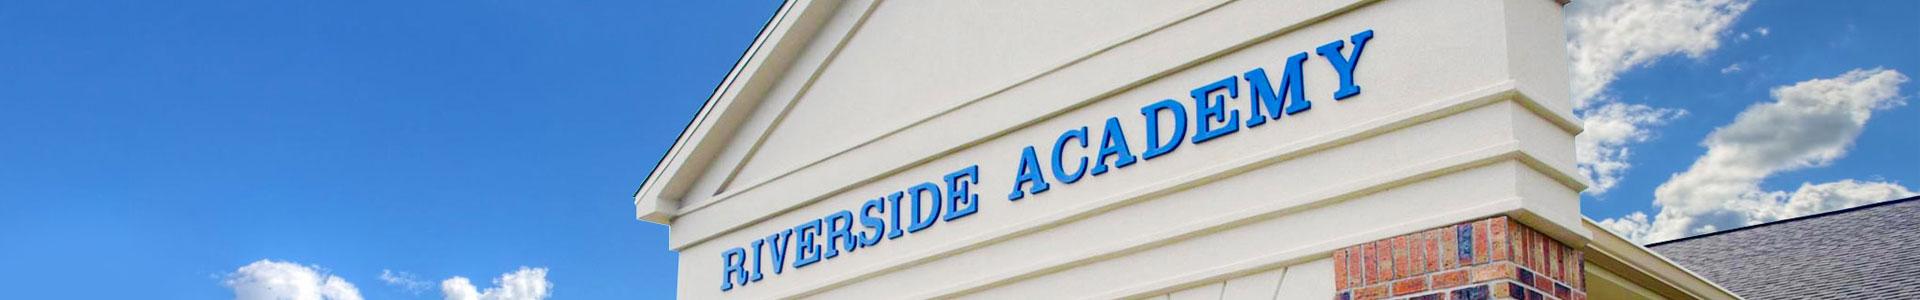 riverside academy header image